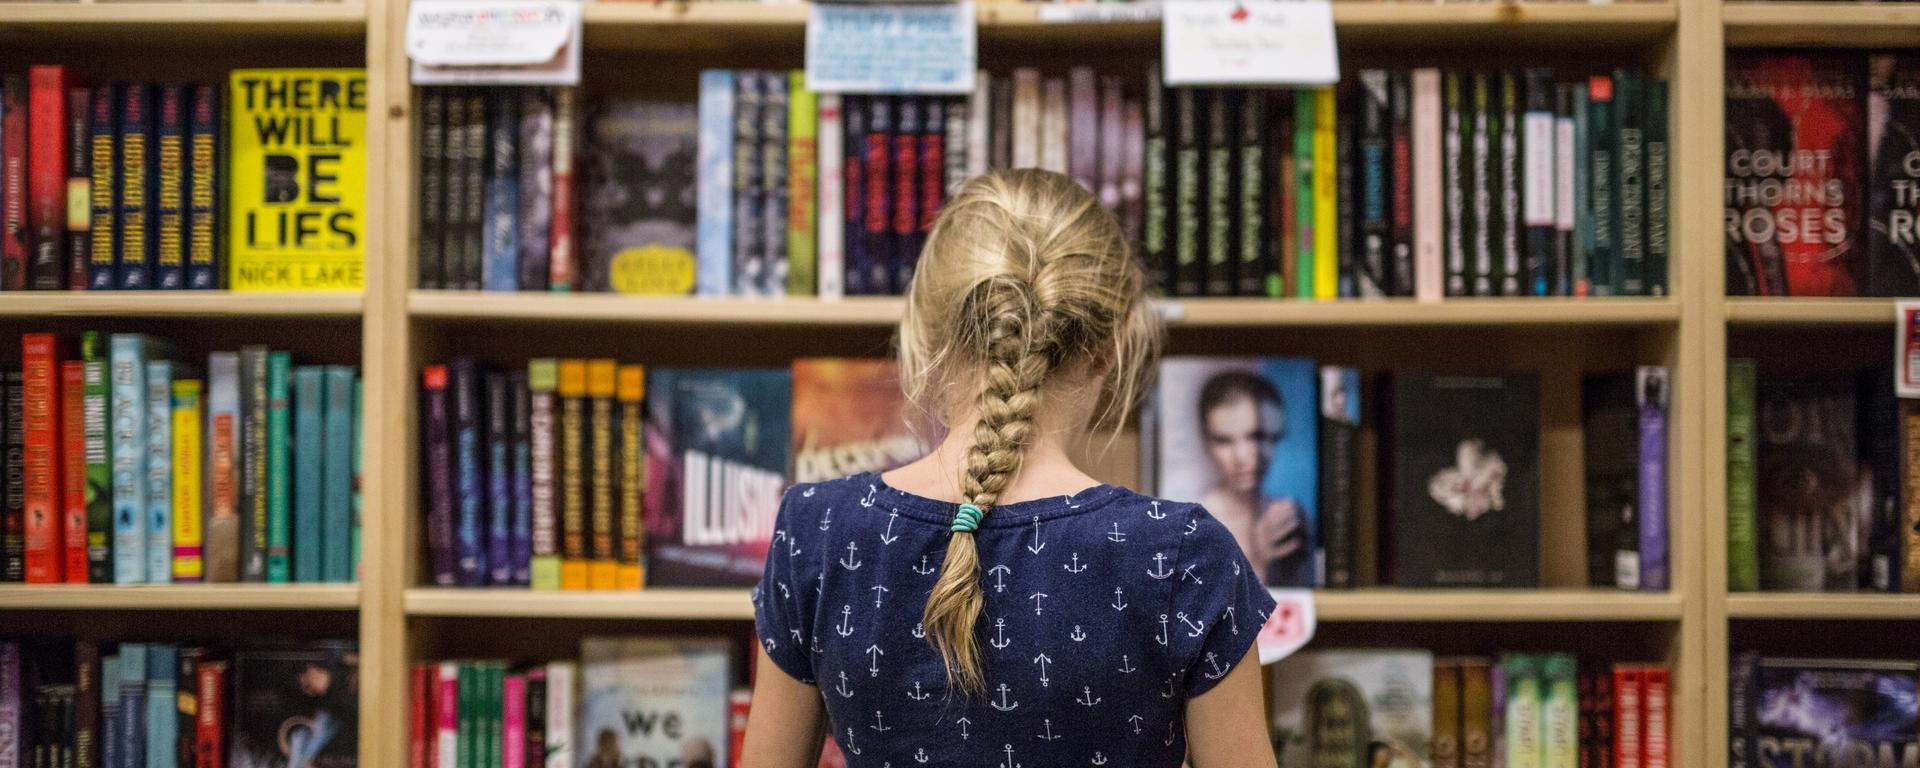 pr-20190125-kid-reads-at-powells-books-burnside-01 1